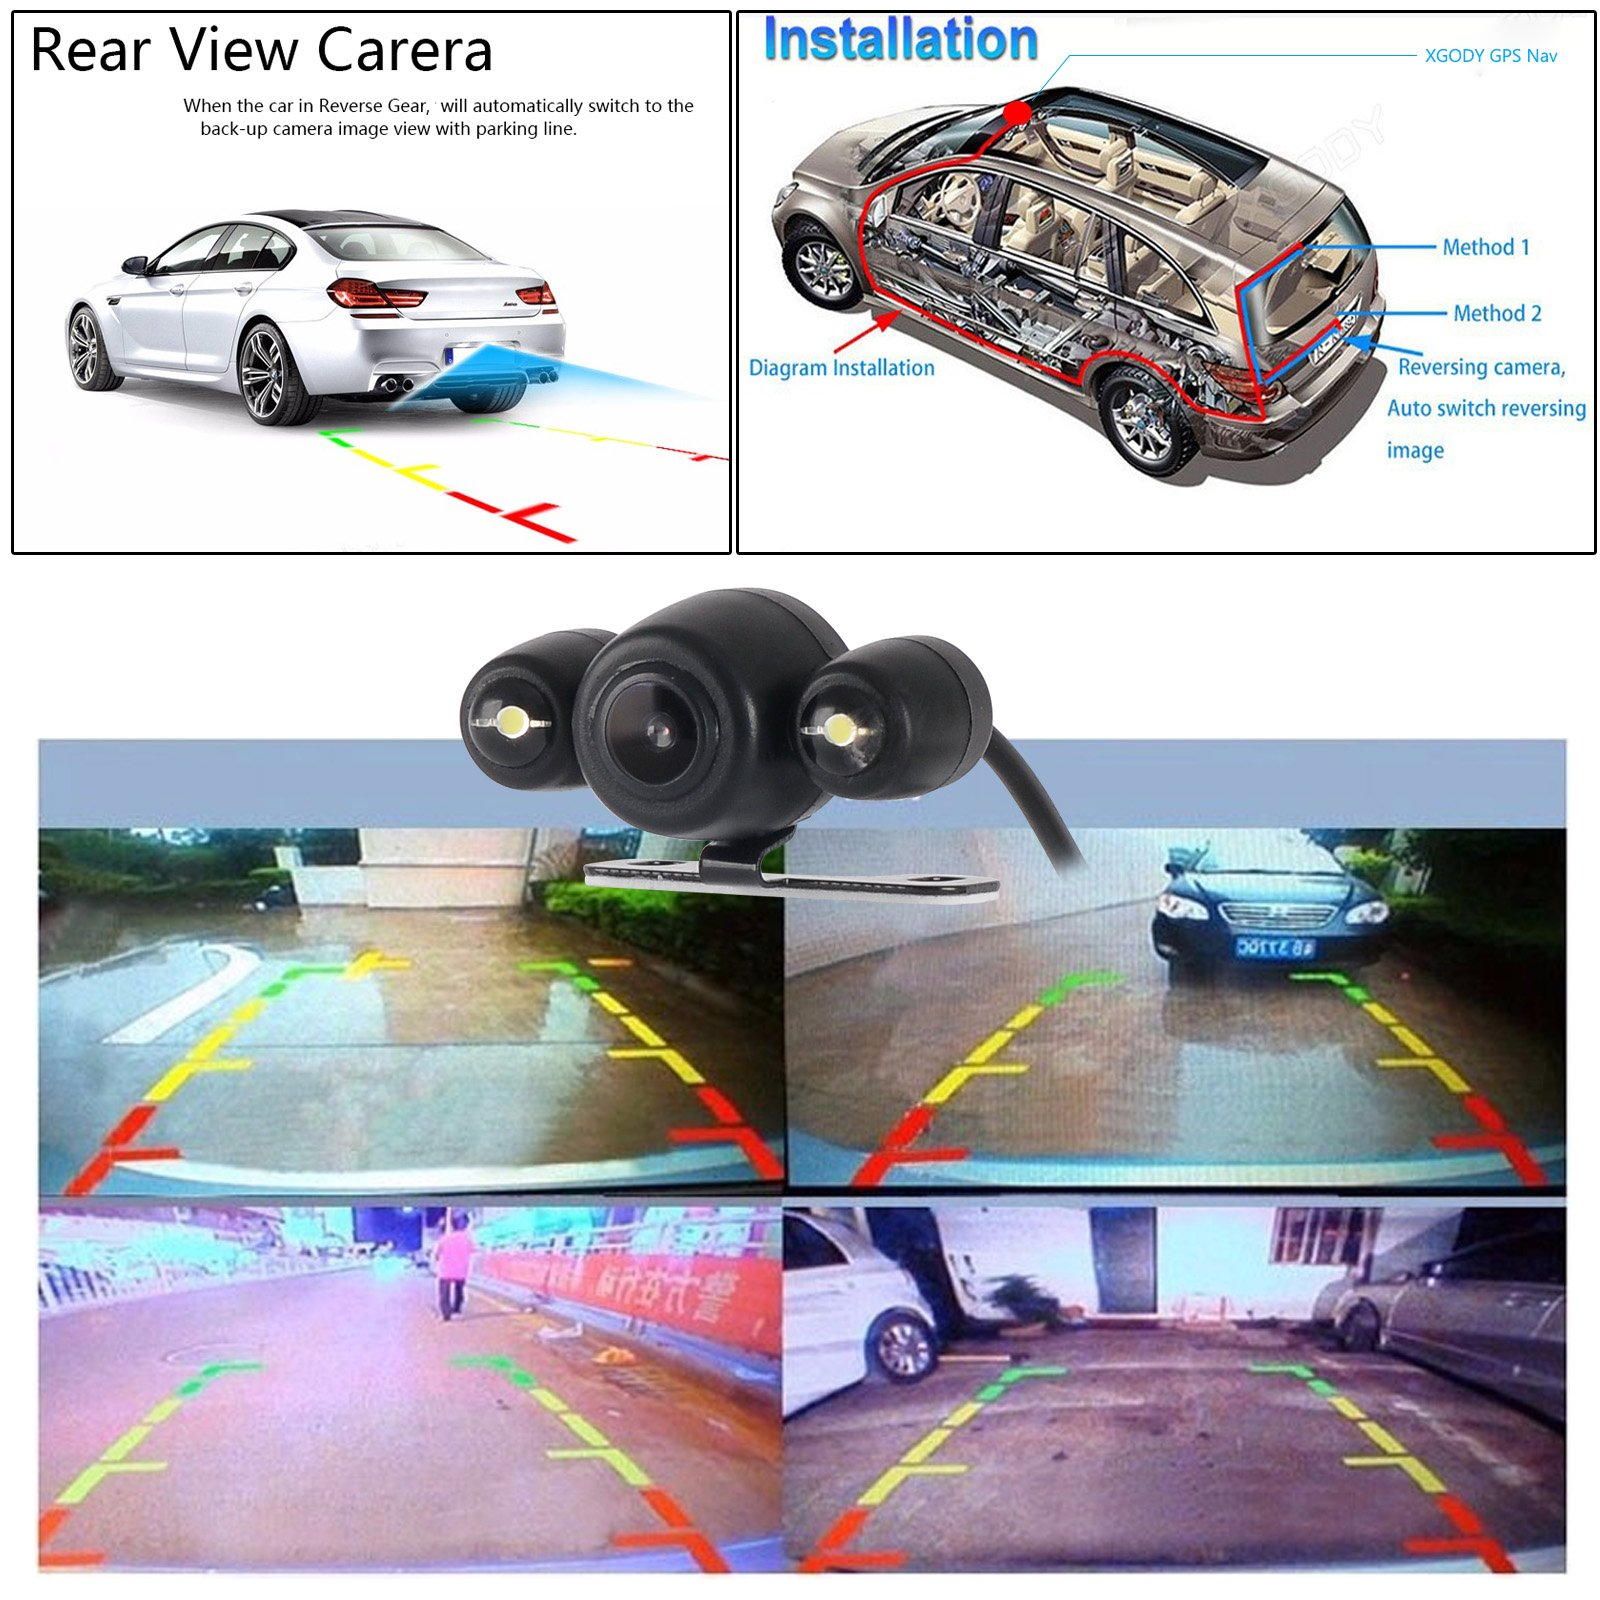 XGody 886 Capacitive Touch Rear Camera Car Navigator